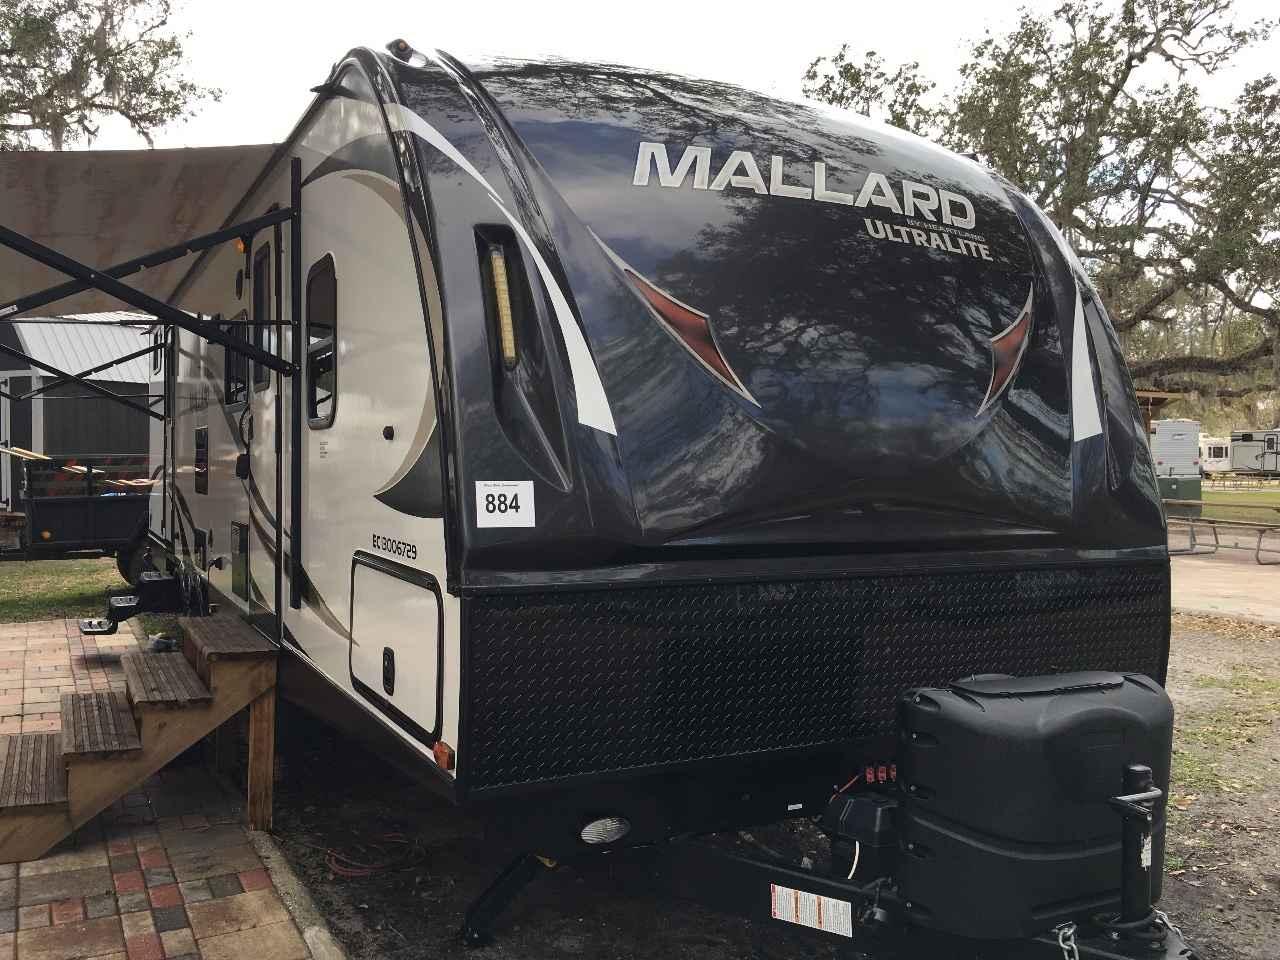 2017 Used Heartland MALLARD M32 Travel Trailer in Florida FL